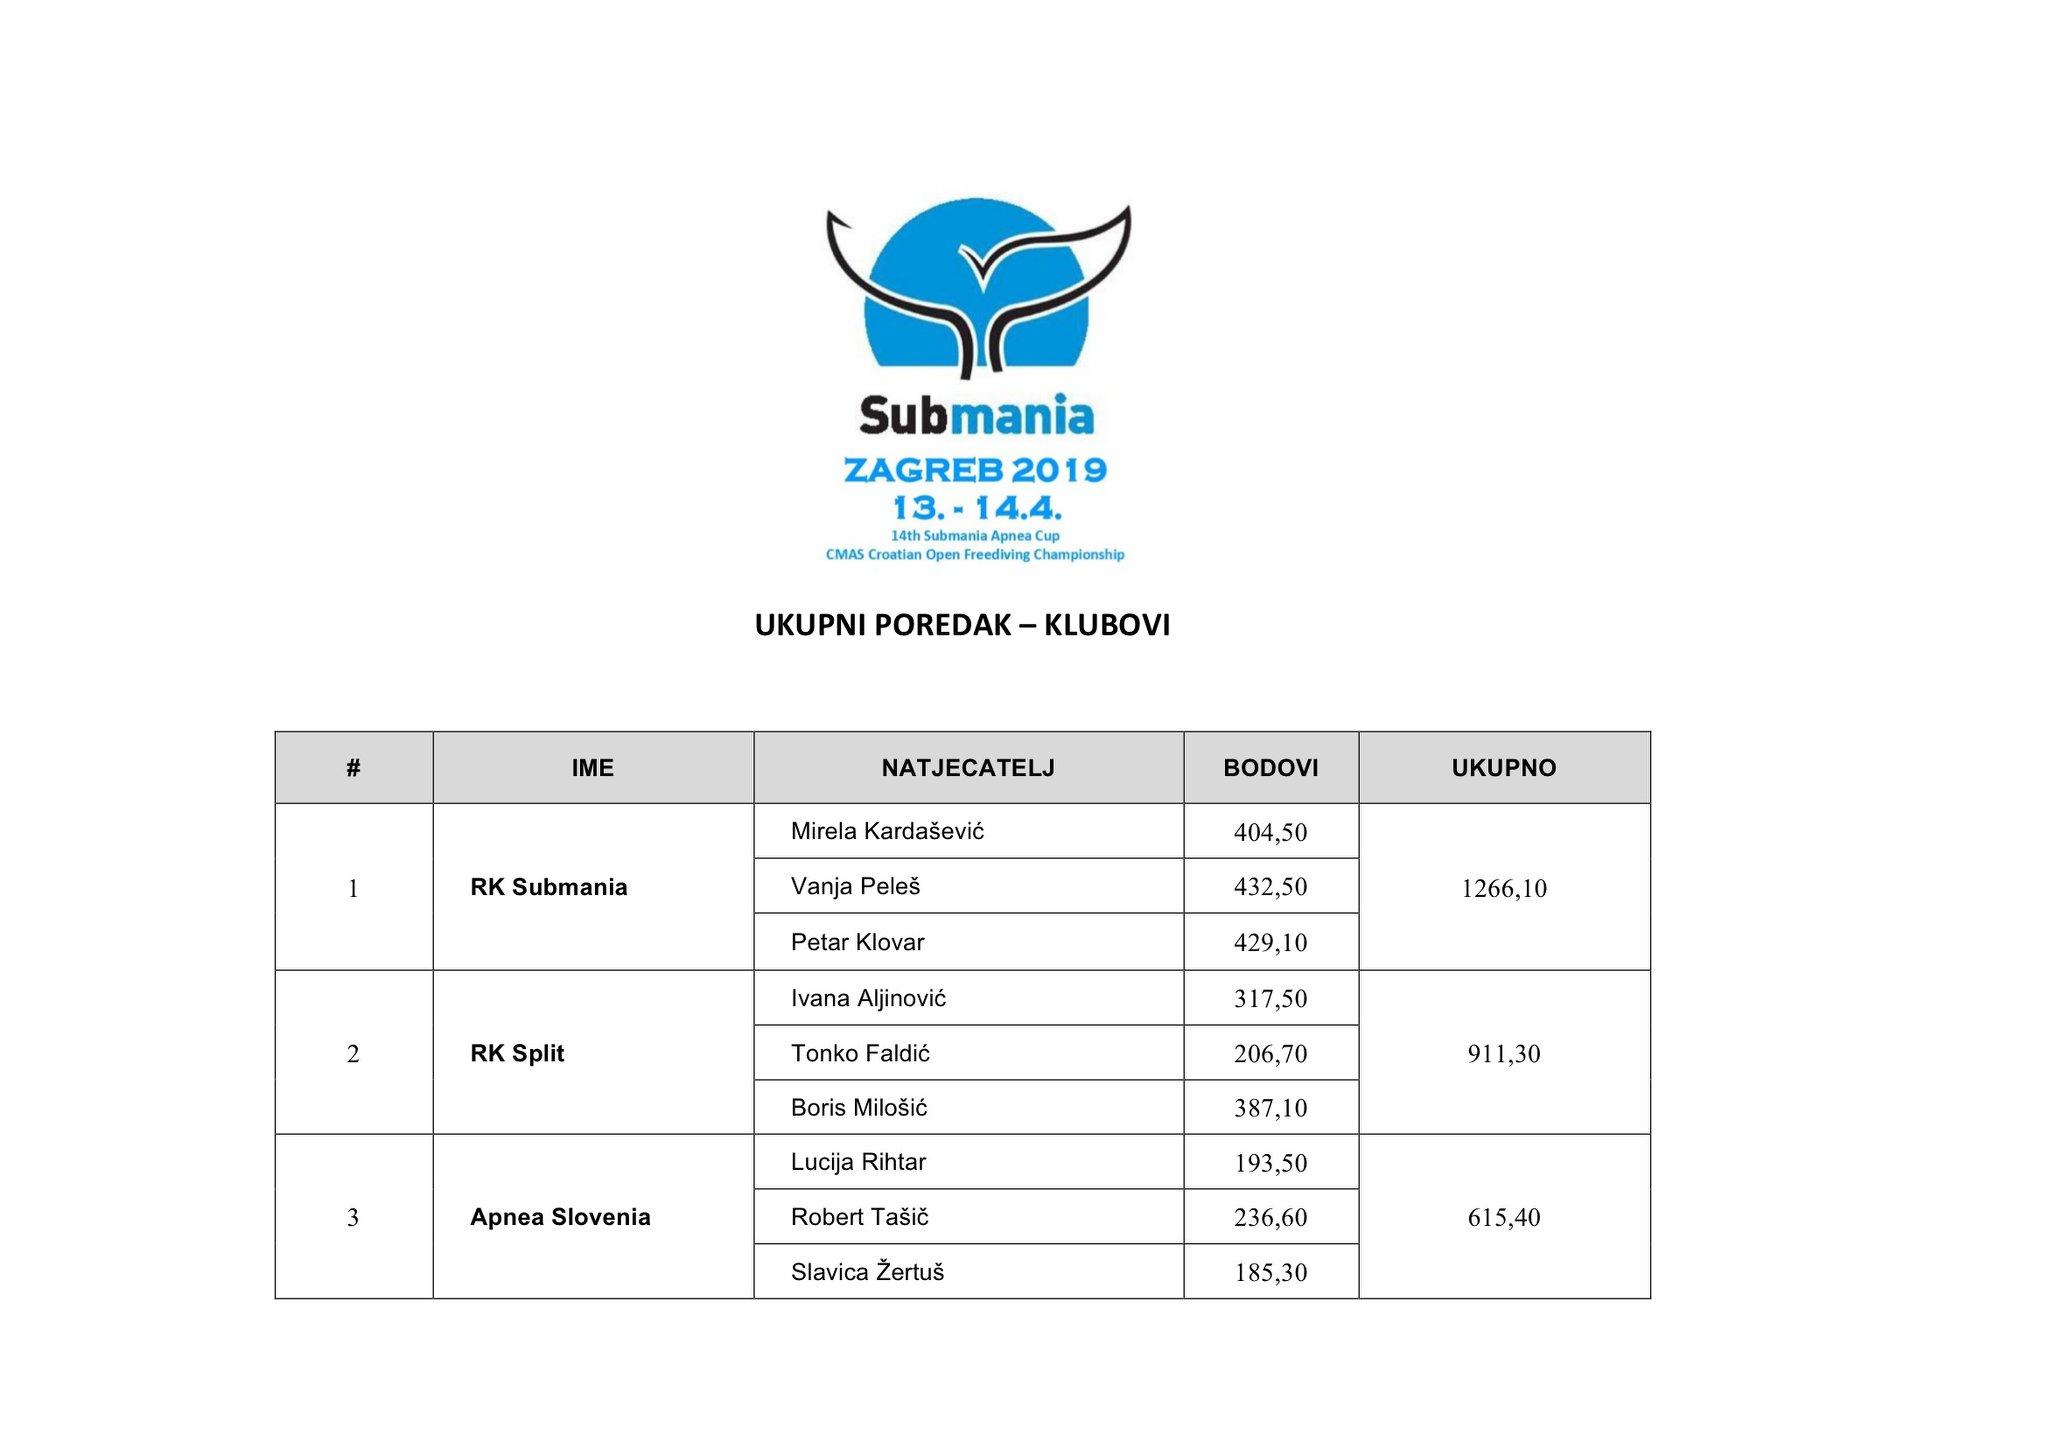 Croatian CMAS National Pool Freediving Championship Results